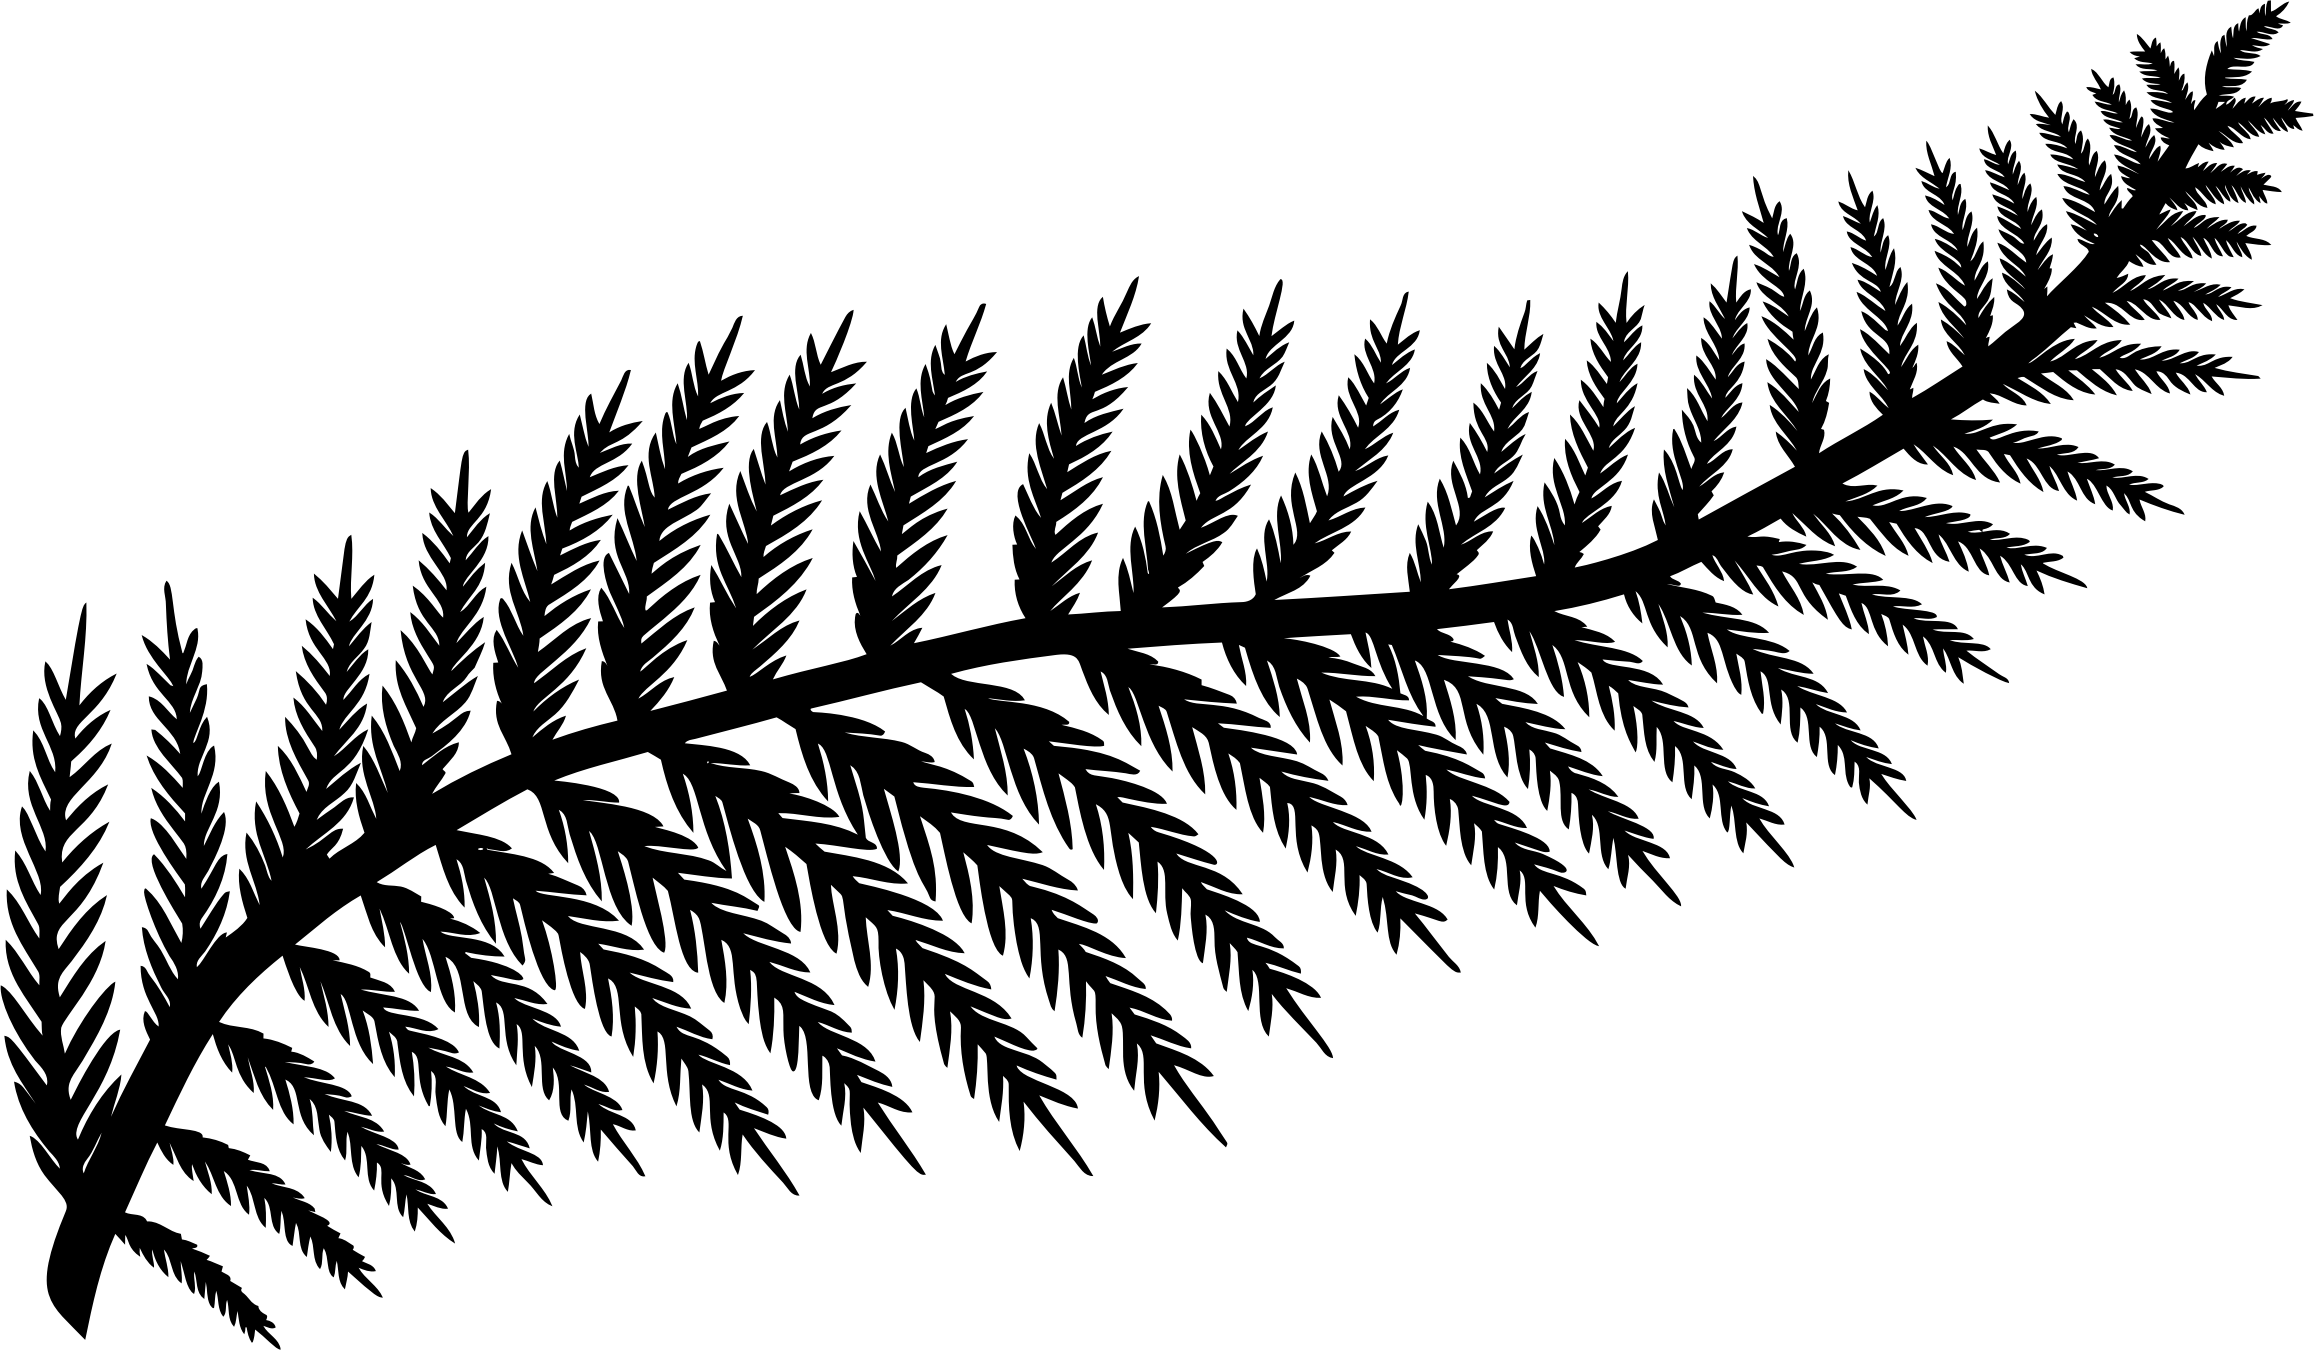 Leaf silhouette by karen. Fern clipart outline